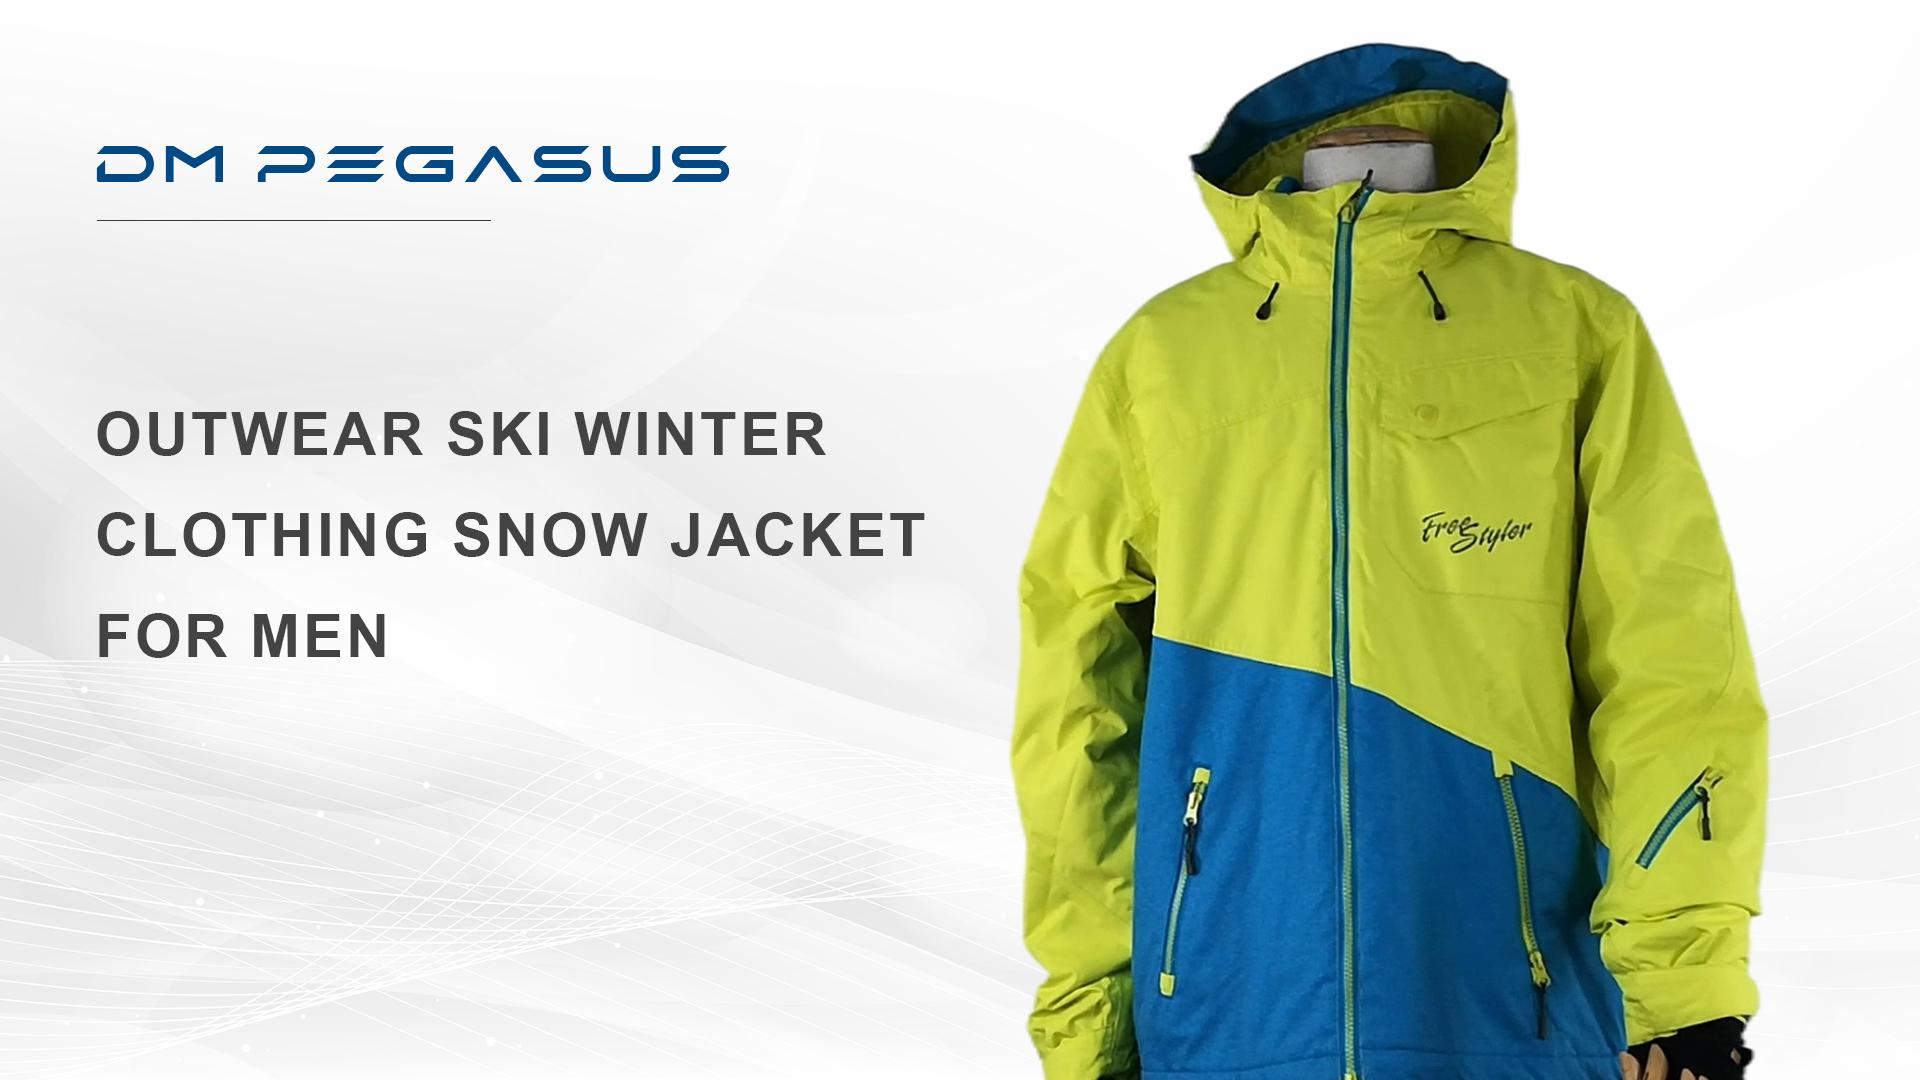 Outwear Ski Winter Clothing Snow Jacket For Men